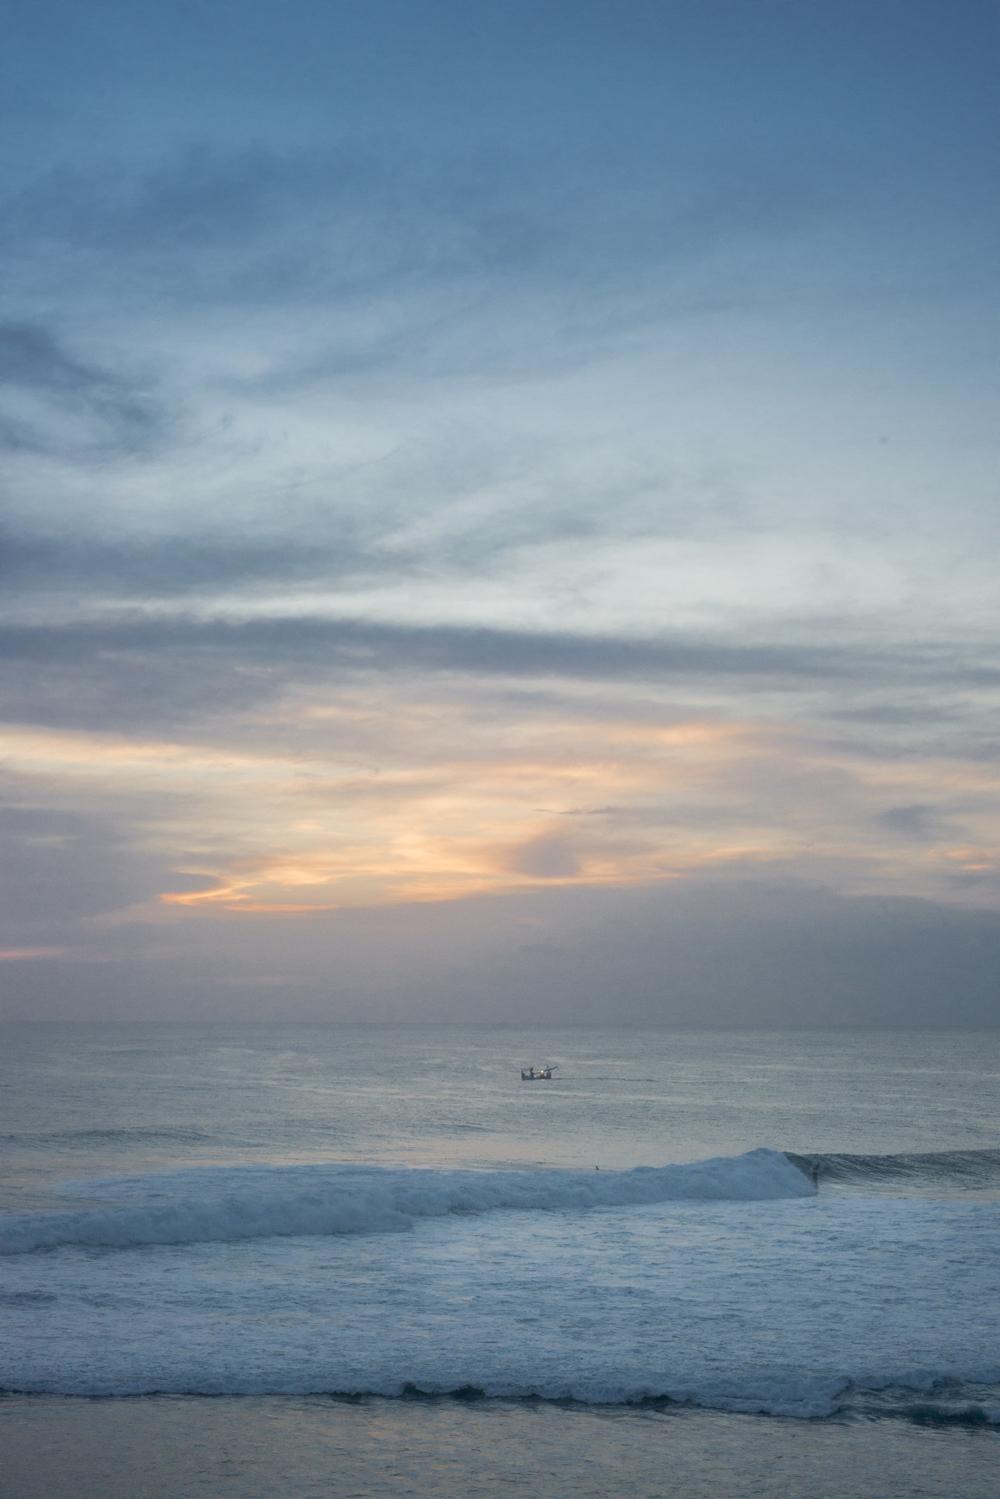 Big swell at Uluwatu. Spot the surfer - looks like an ant.